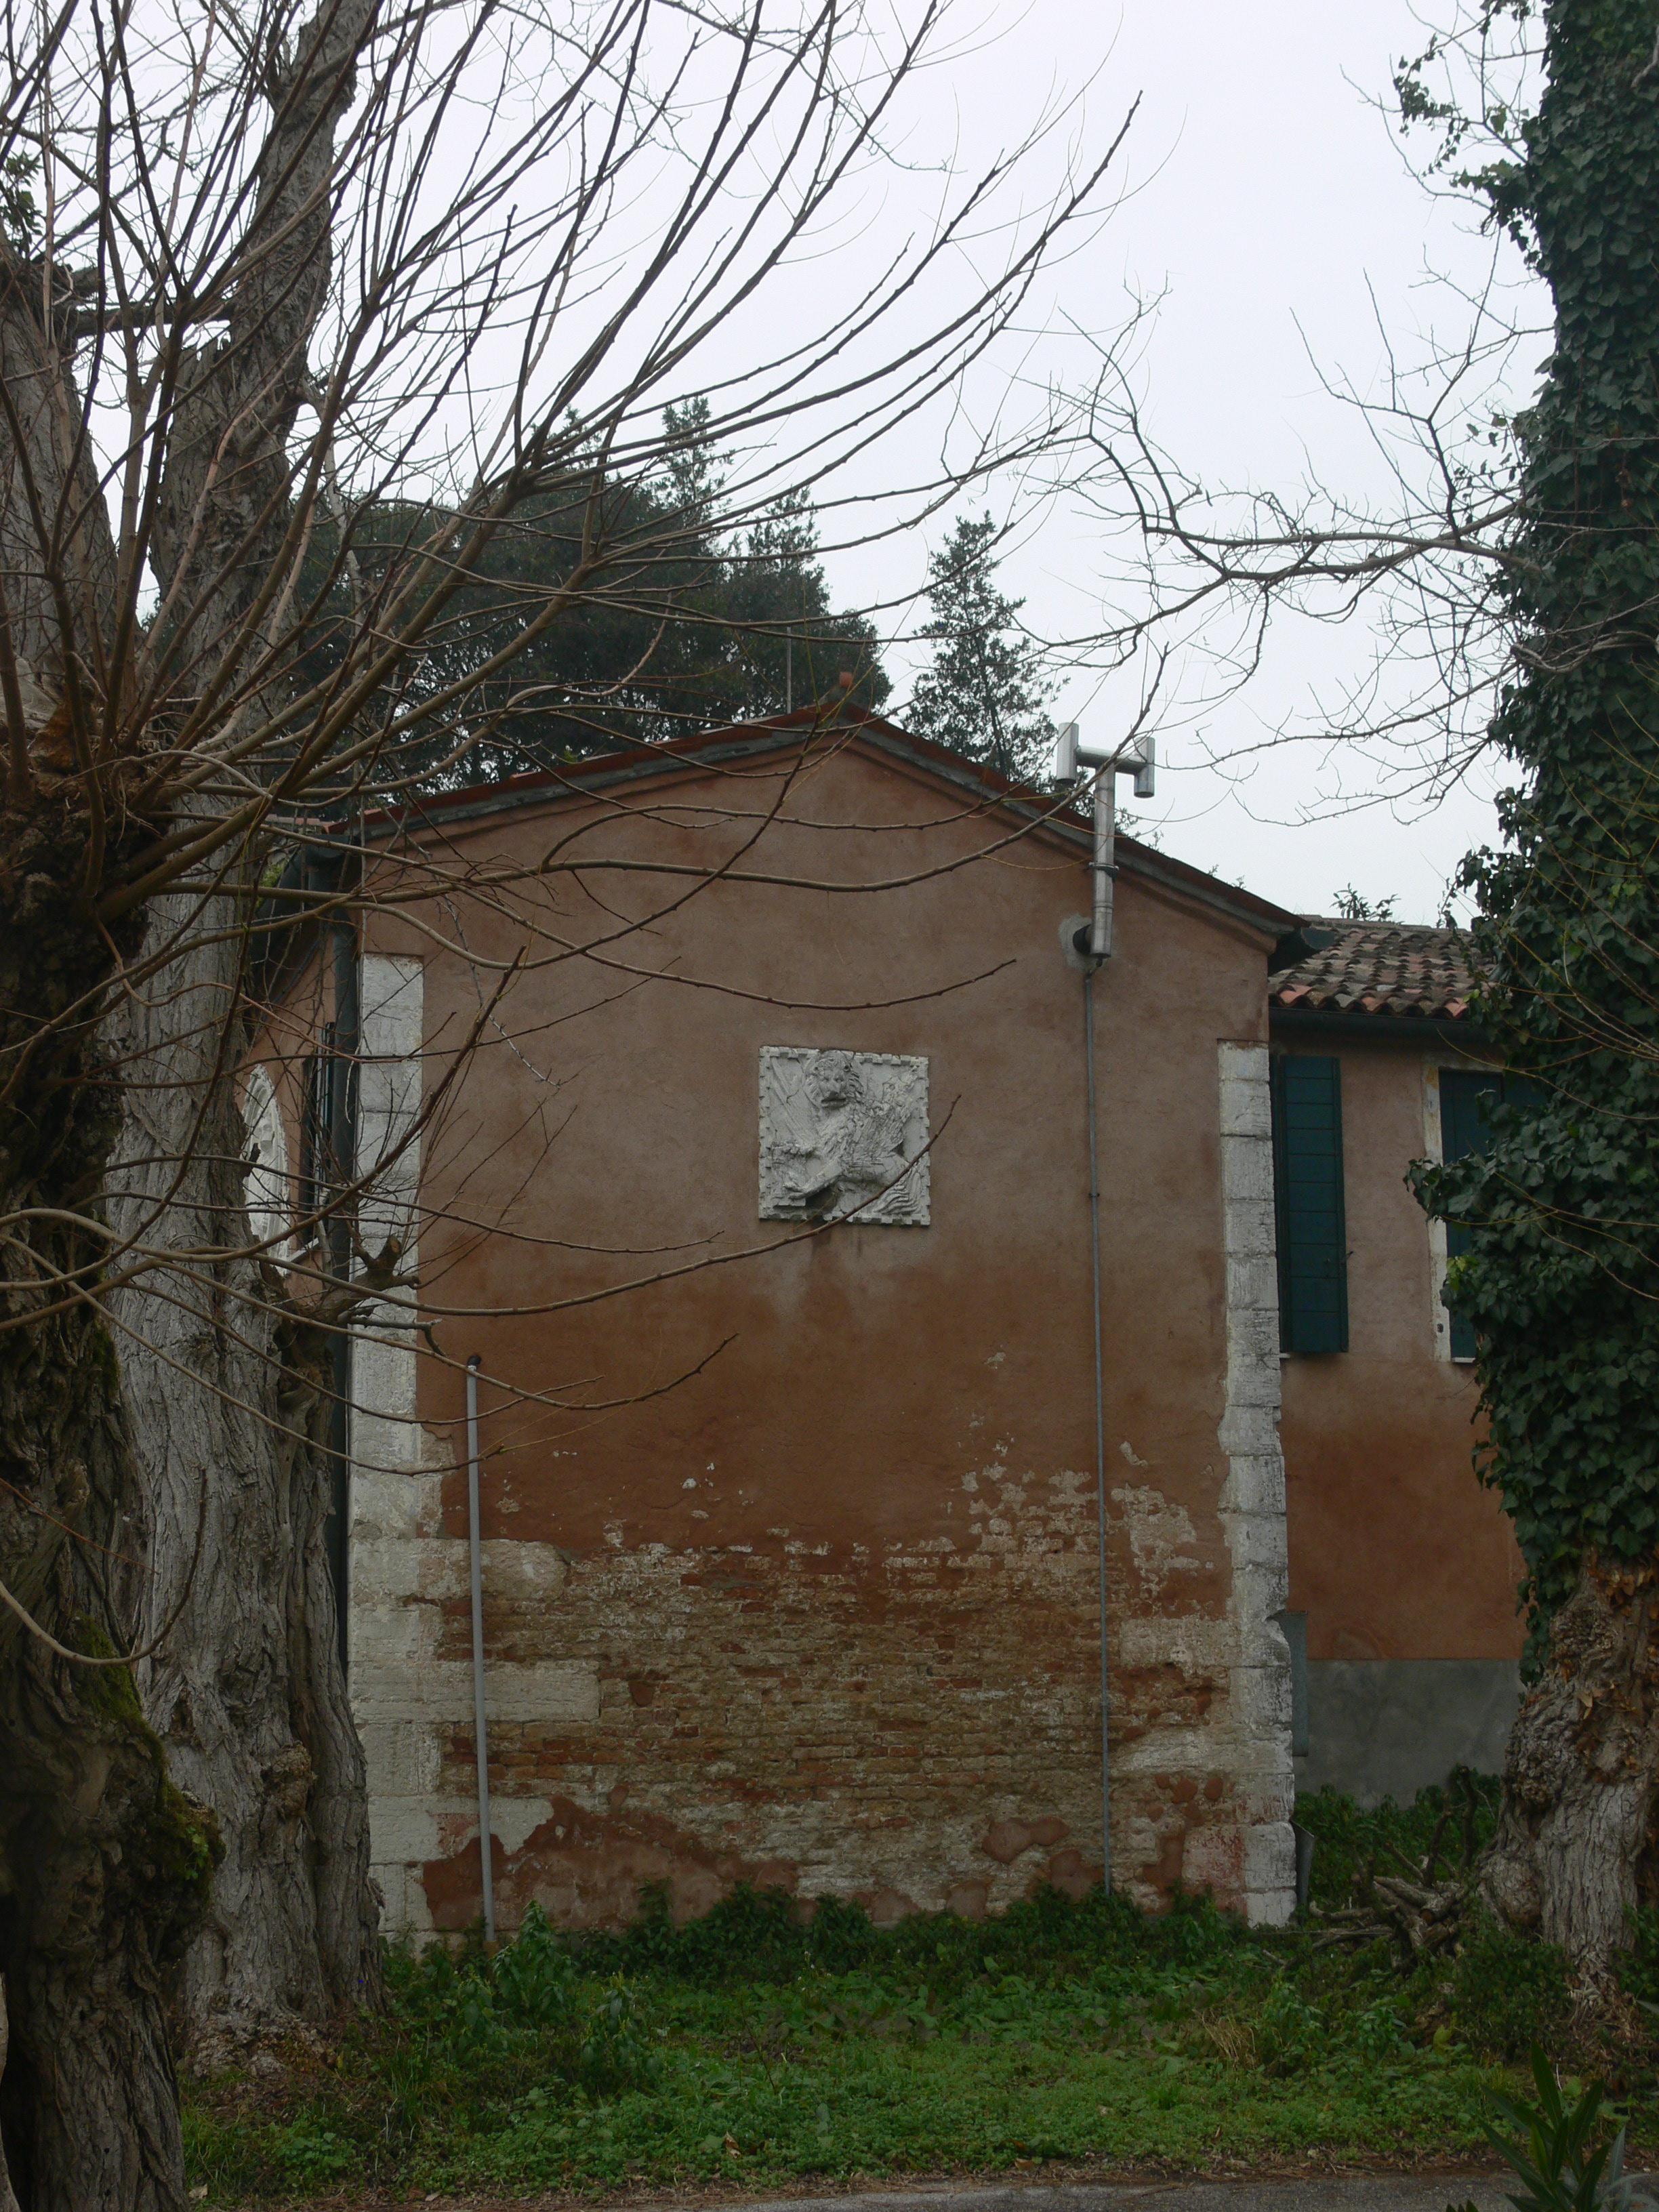 https://upload.wikimedia.org/wikipedia/commons/0/0e/Lido_di_Venezia_-_Residence_Soggiorno_Marino%2C_Marina_Militare_-_house.JPG